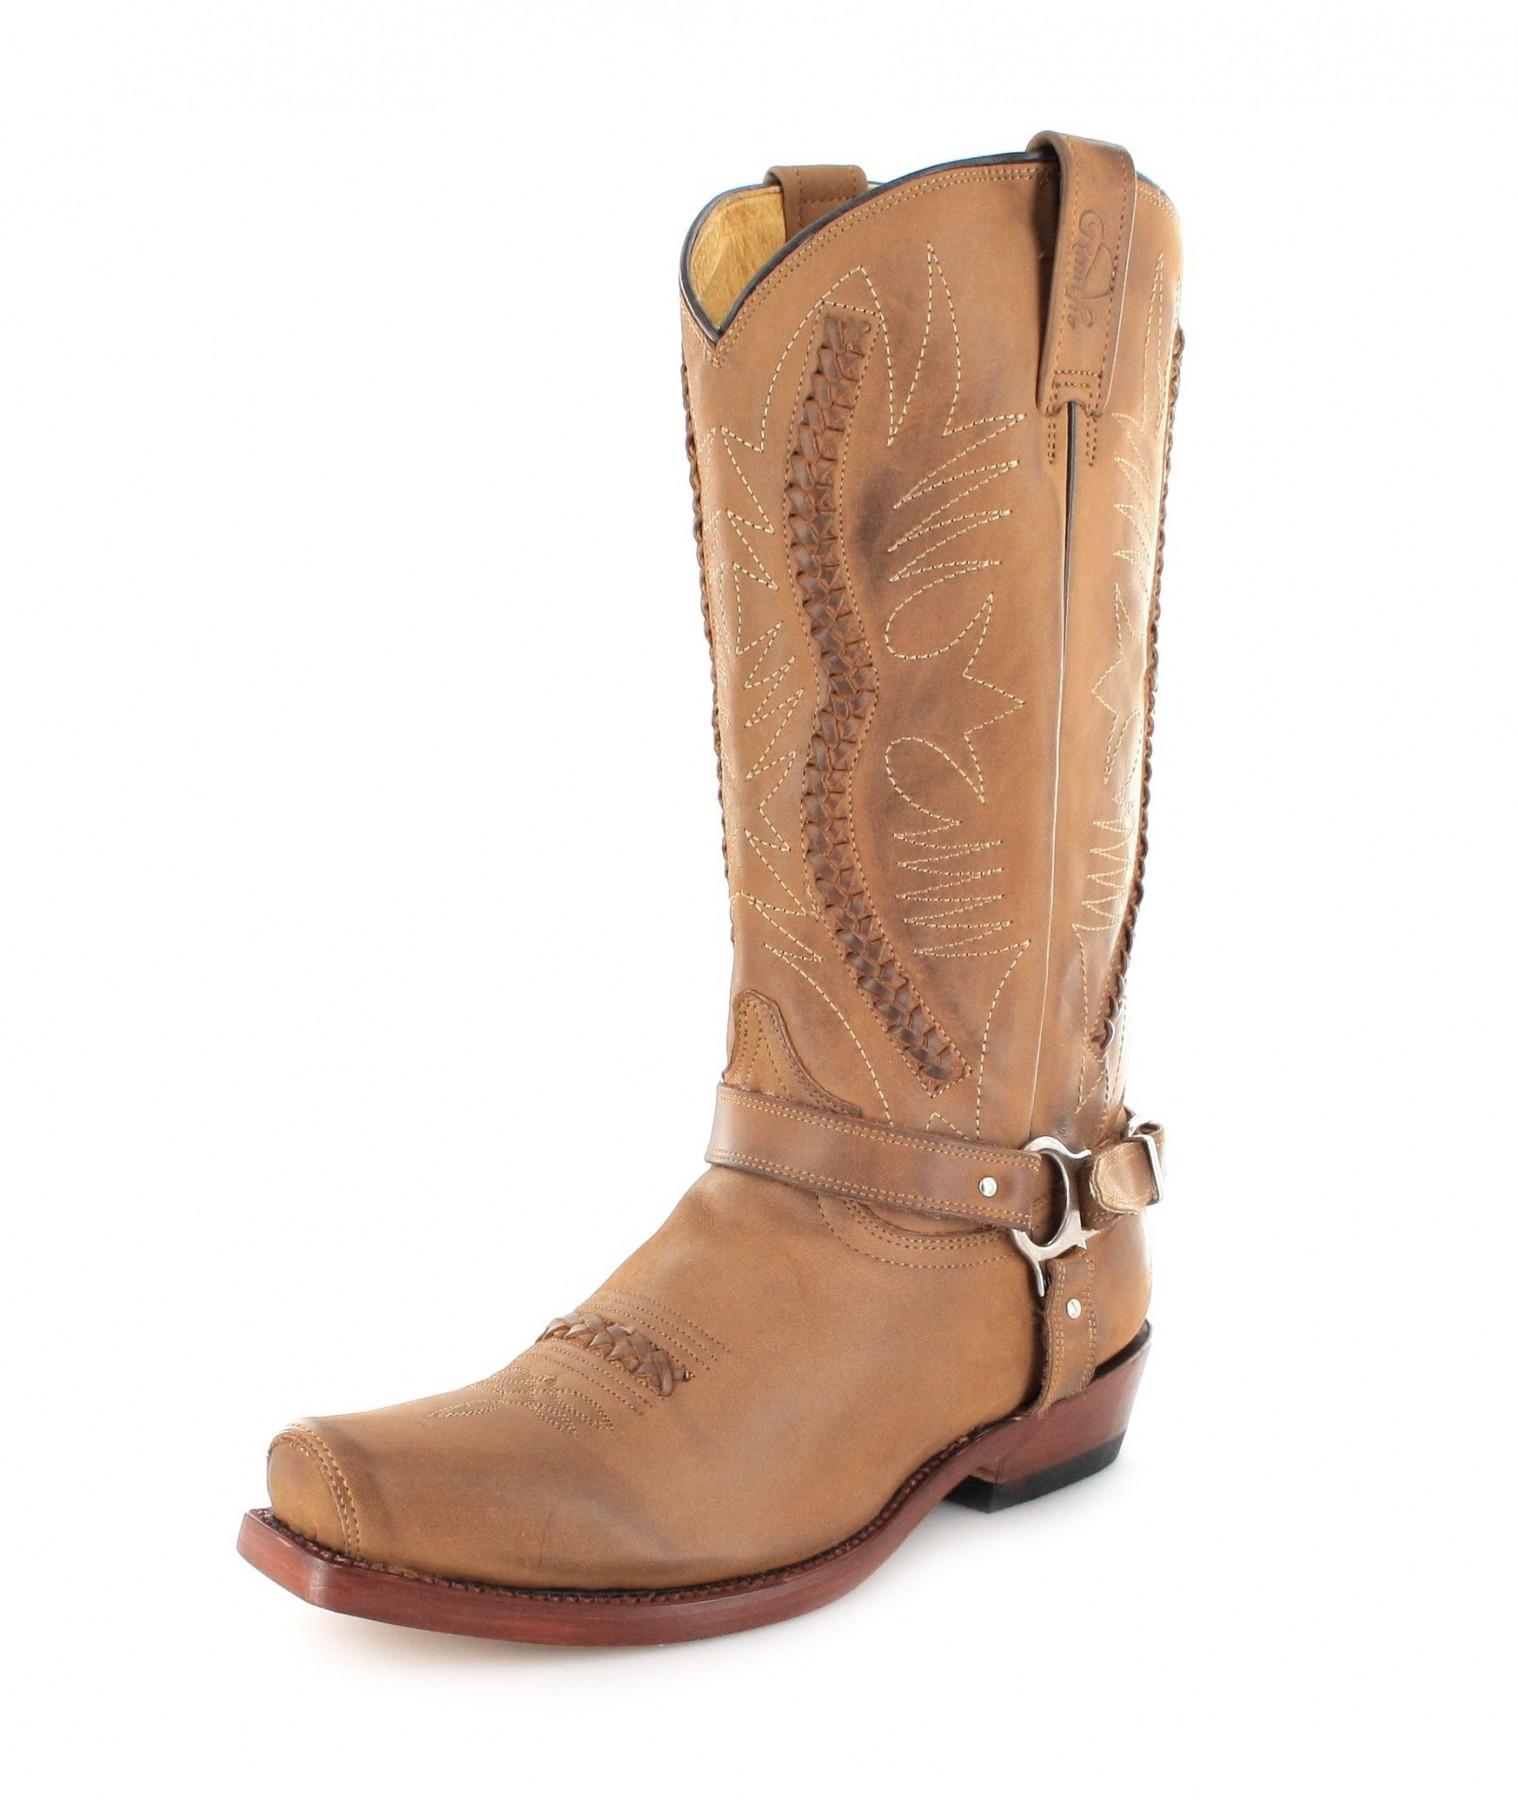 rancho boots 1562 beige biker boot beige fashion boots. Black Bedroom Furniture Sets. Home Design Ideas